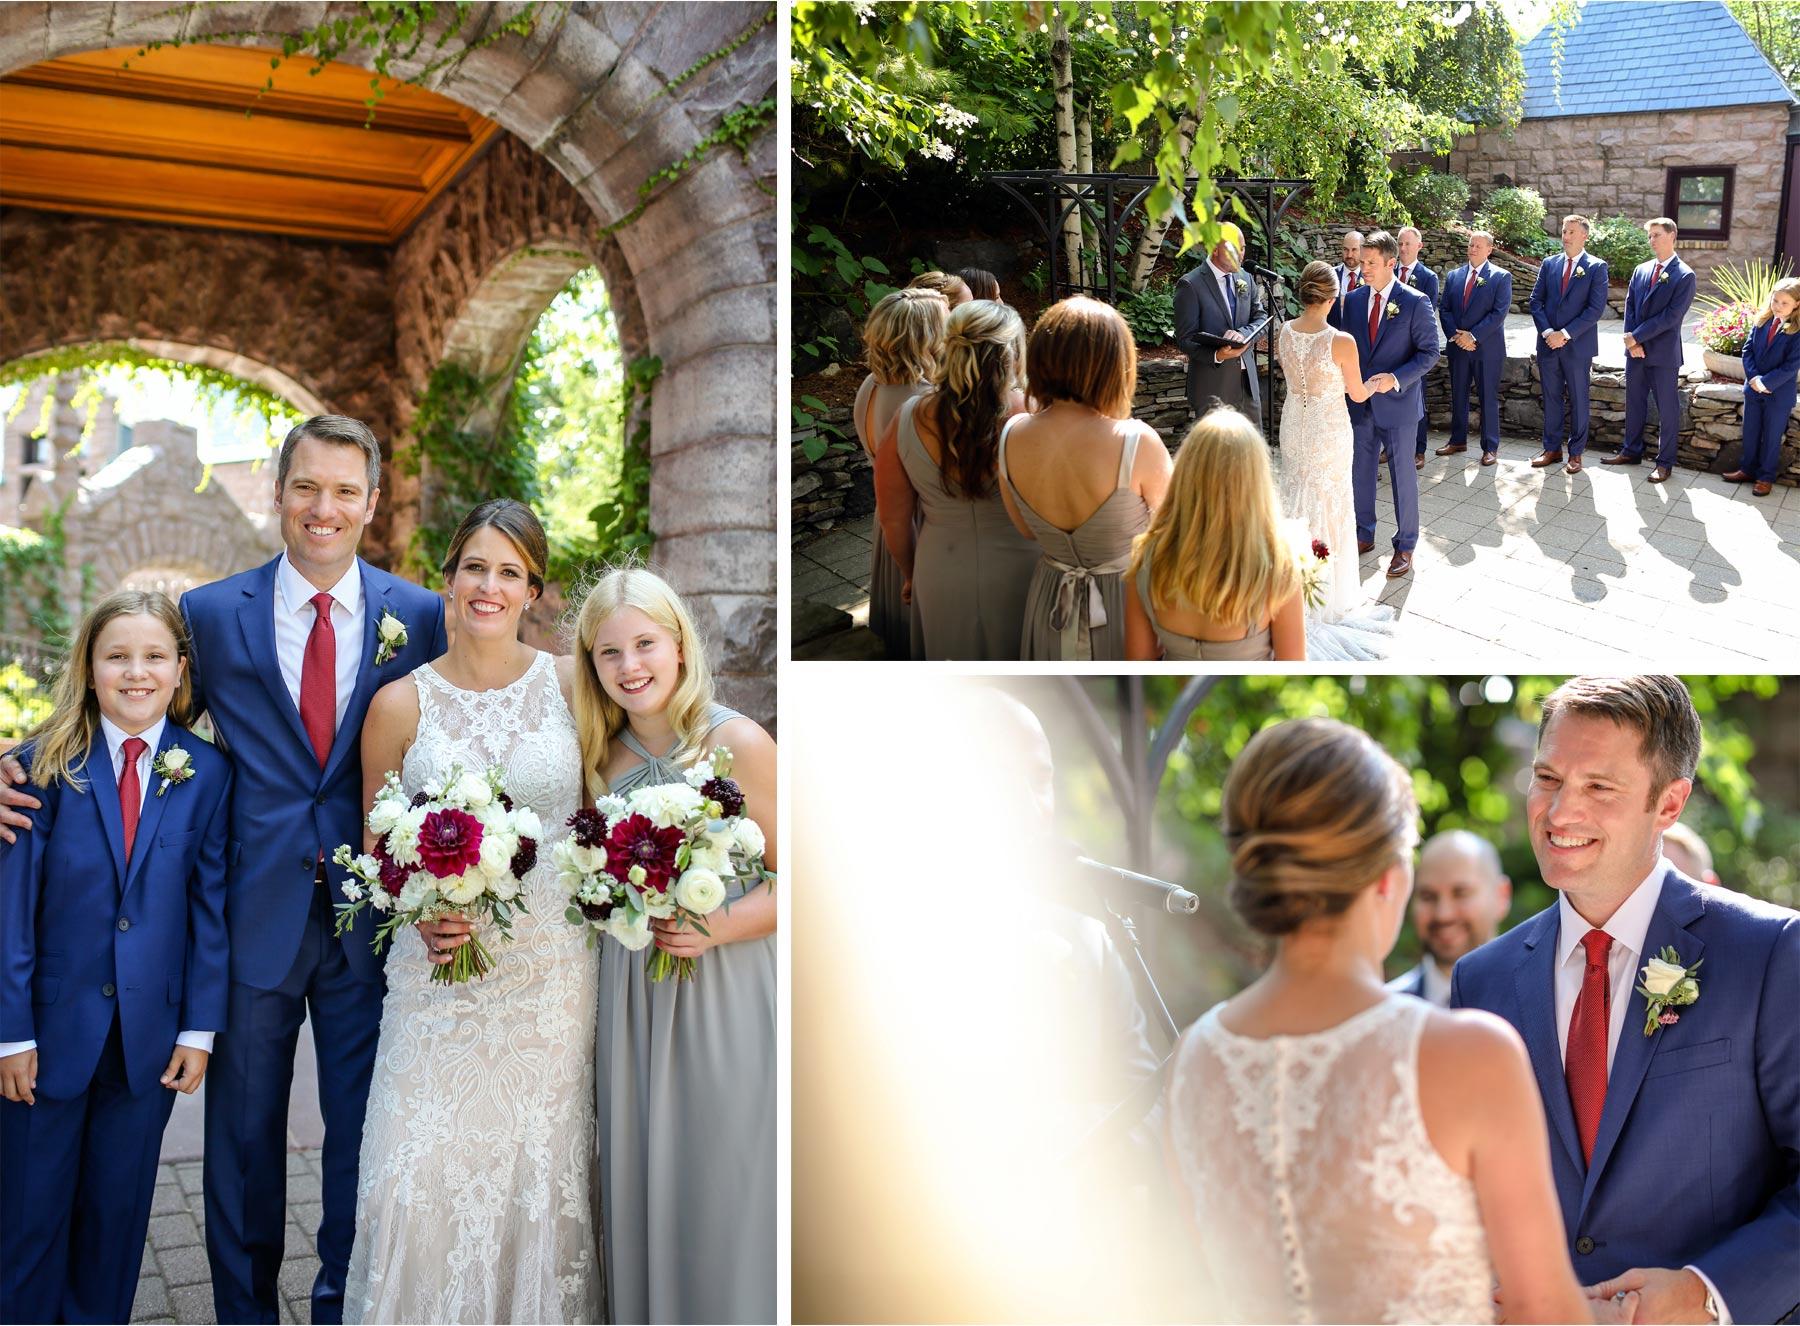 14-Minneapolis-Minnesota-Wedding-Photographer-by-Vick-Photography-Van-Dusen-Mansion-Outdoor-Ceremony-Megan-and-Ned.jpg